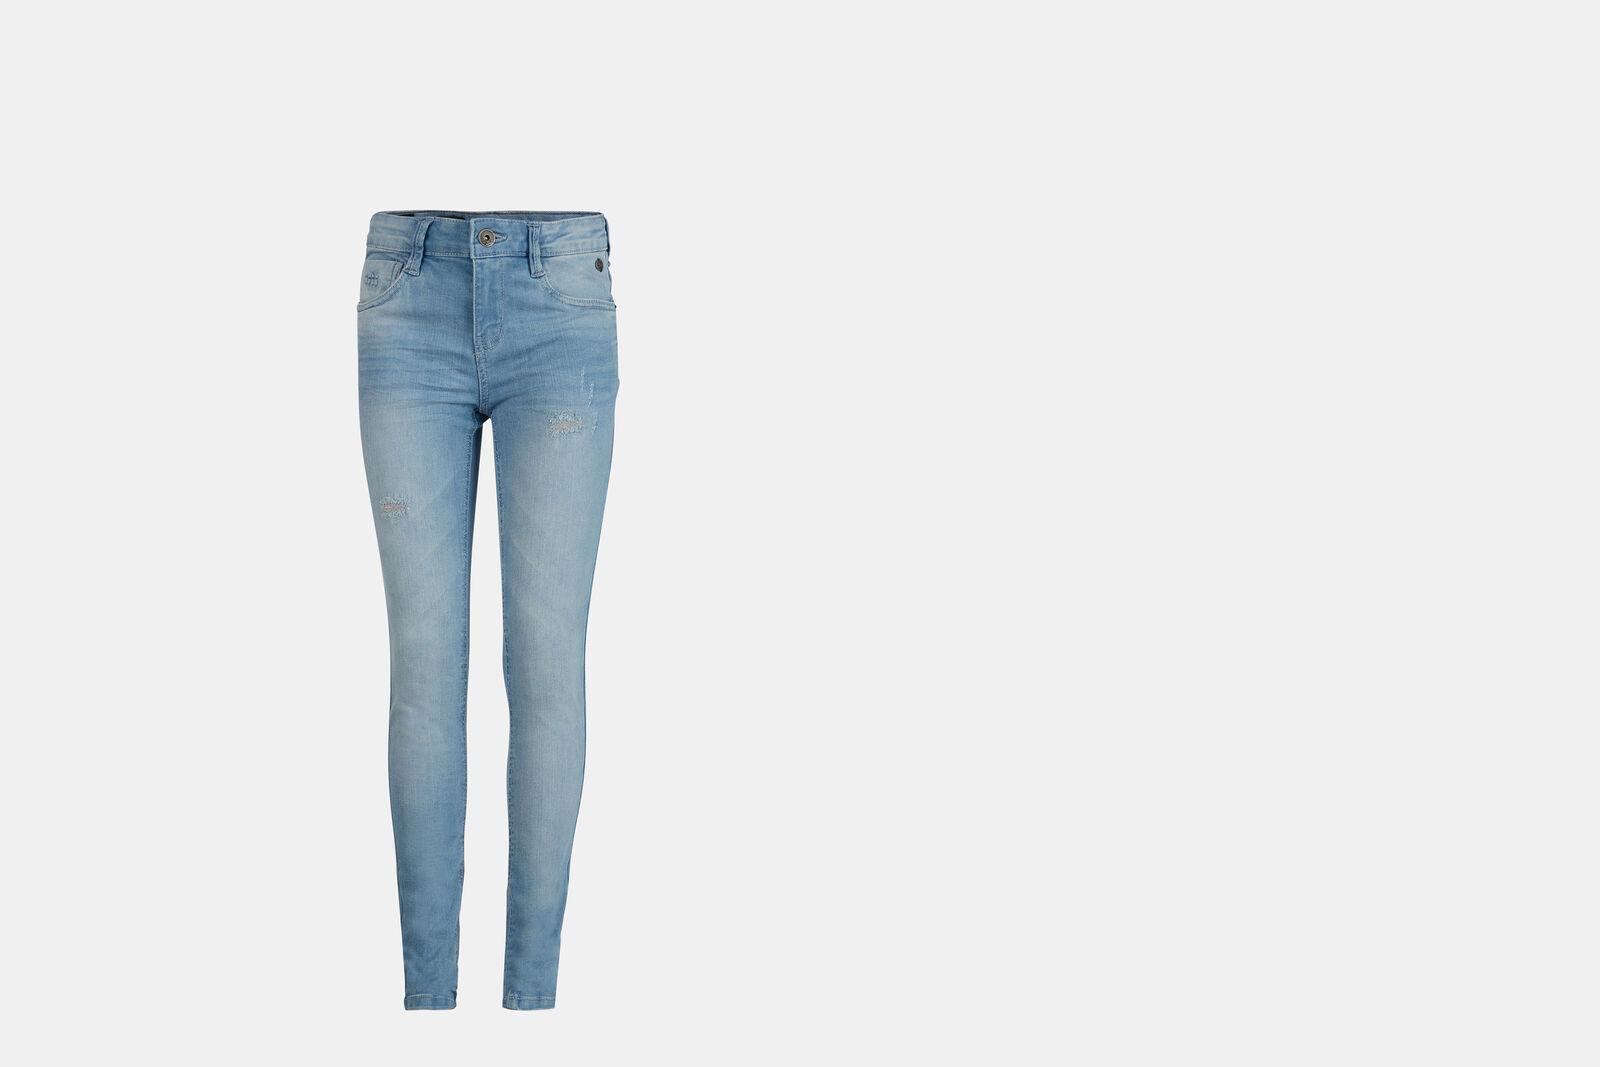 Baxel Skinny Jeans